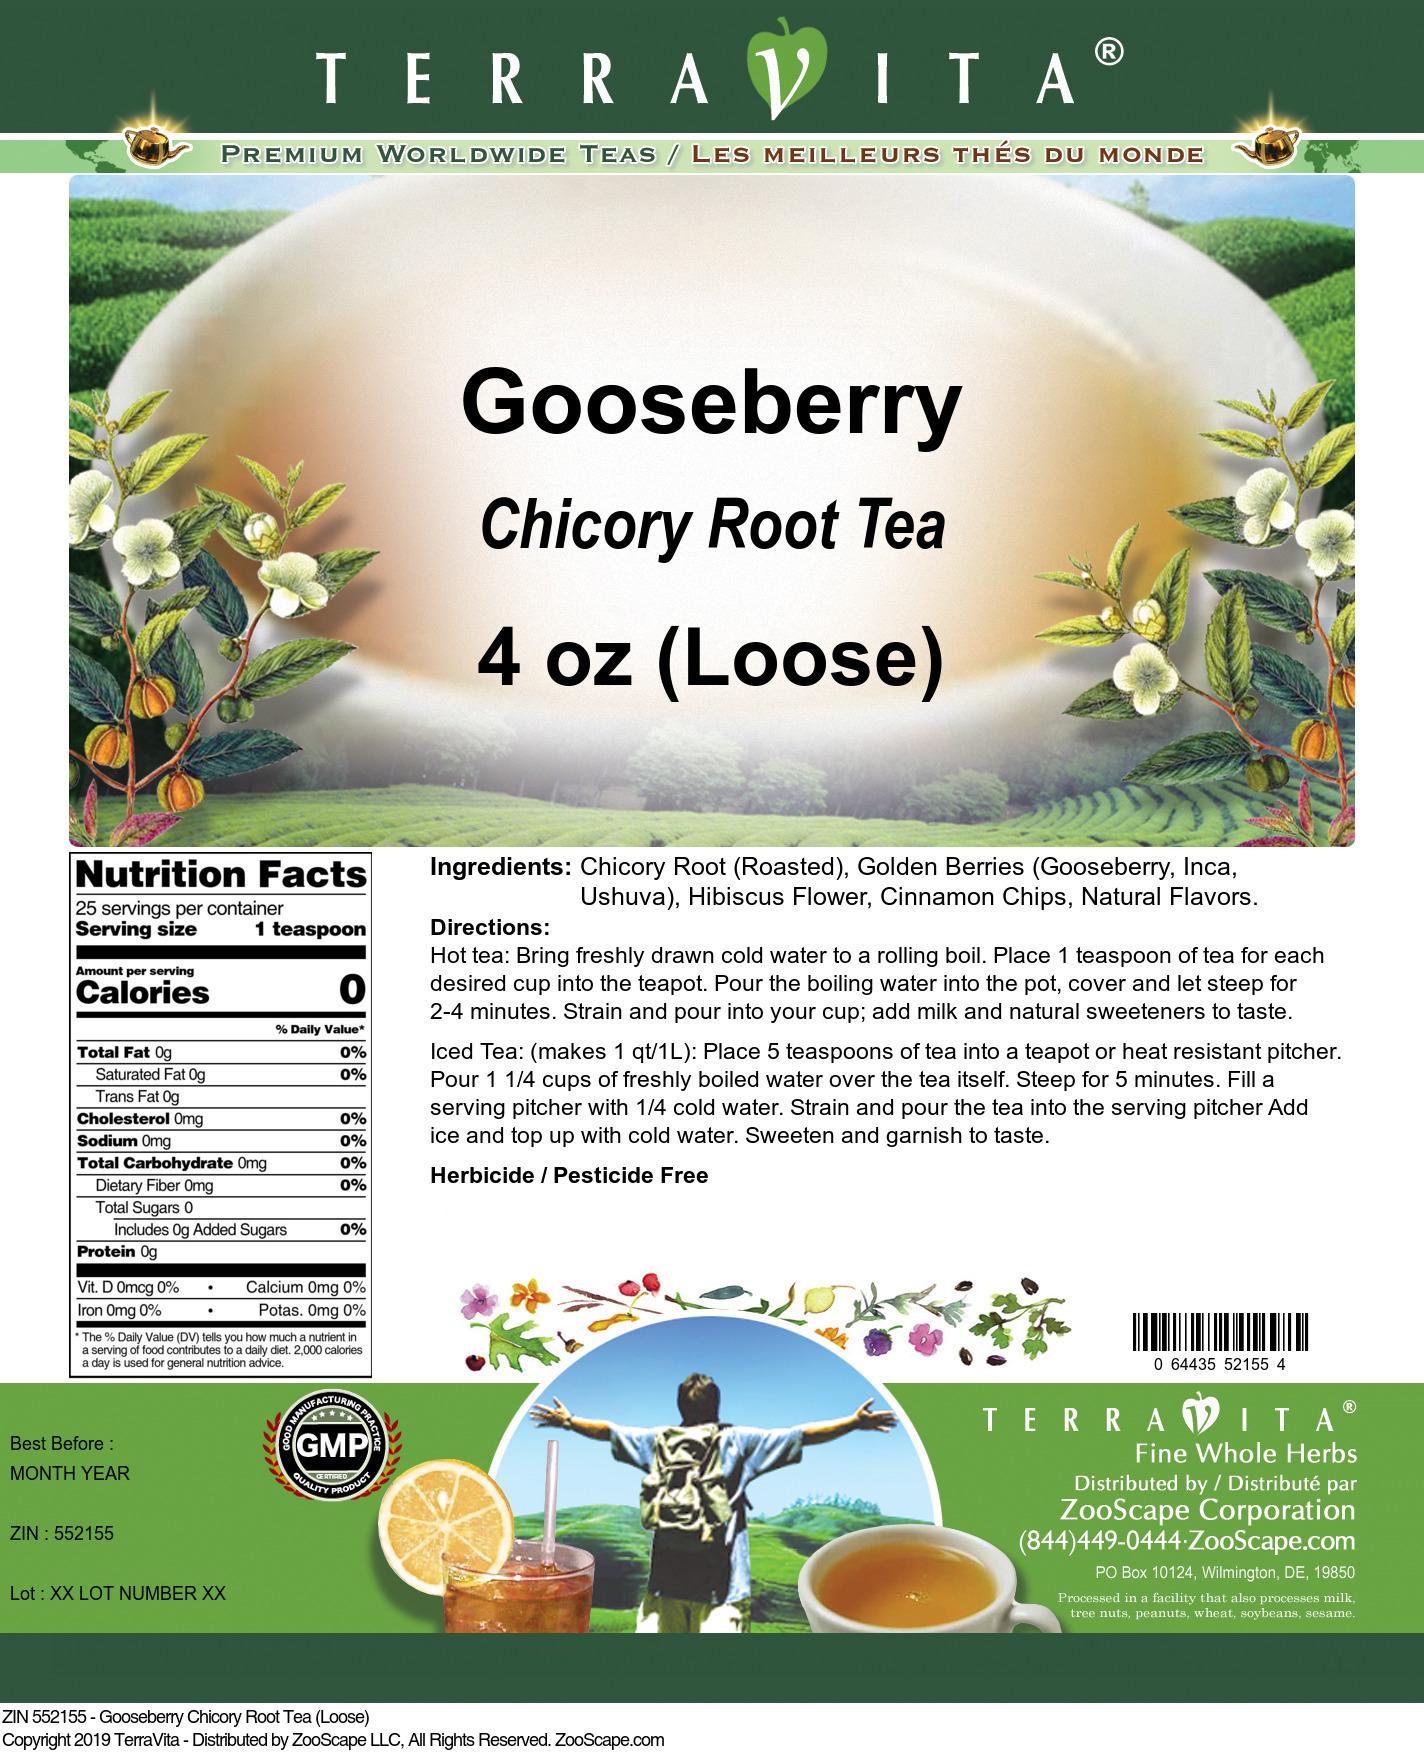 Gooseberry Chicory Root Tea (Loose)